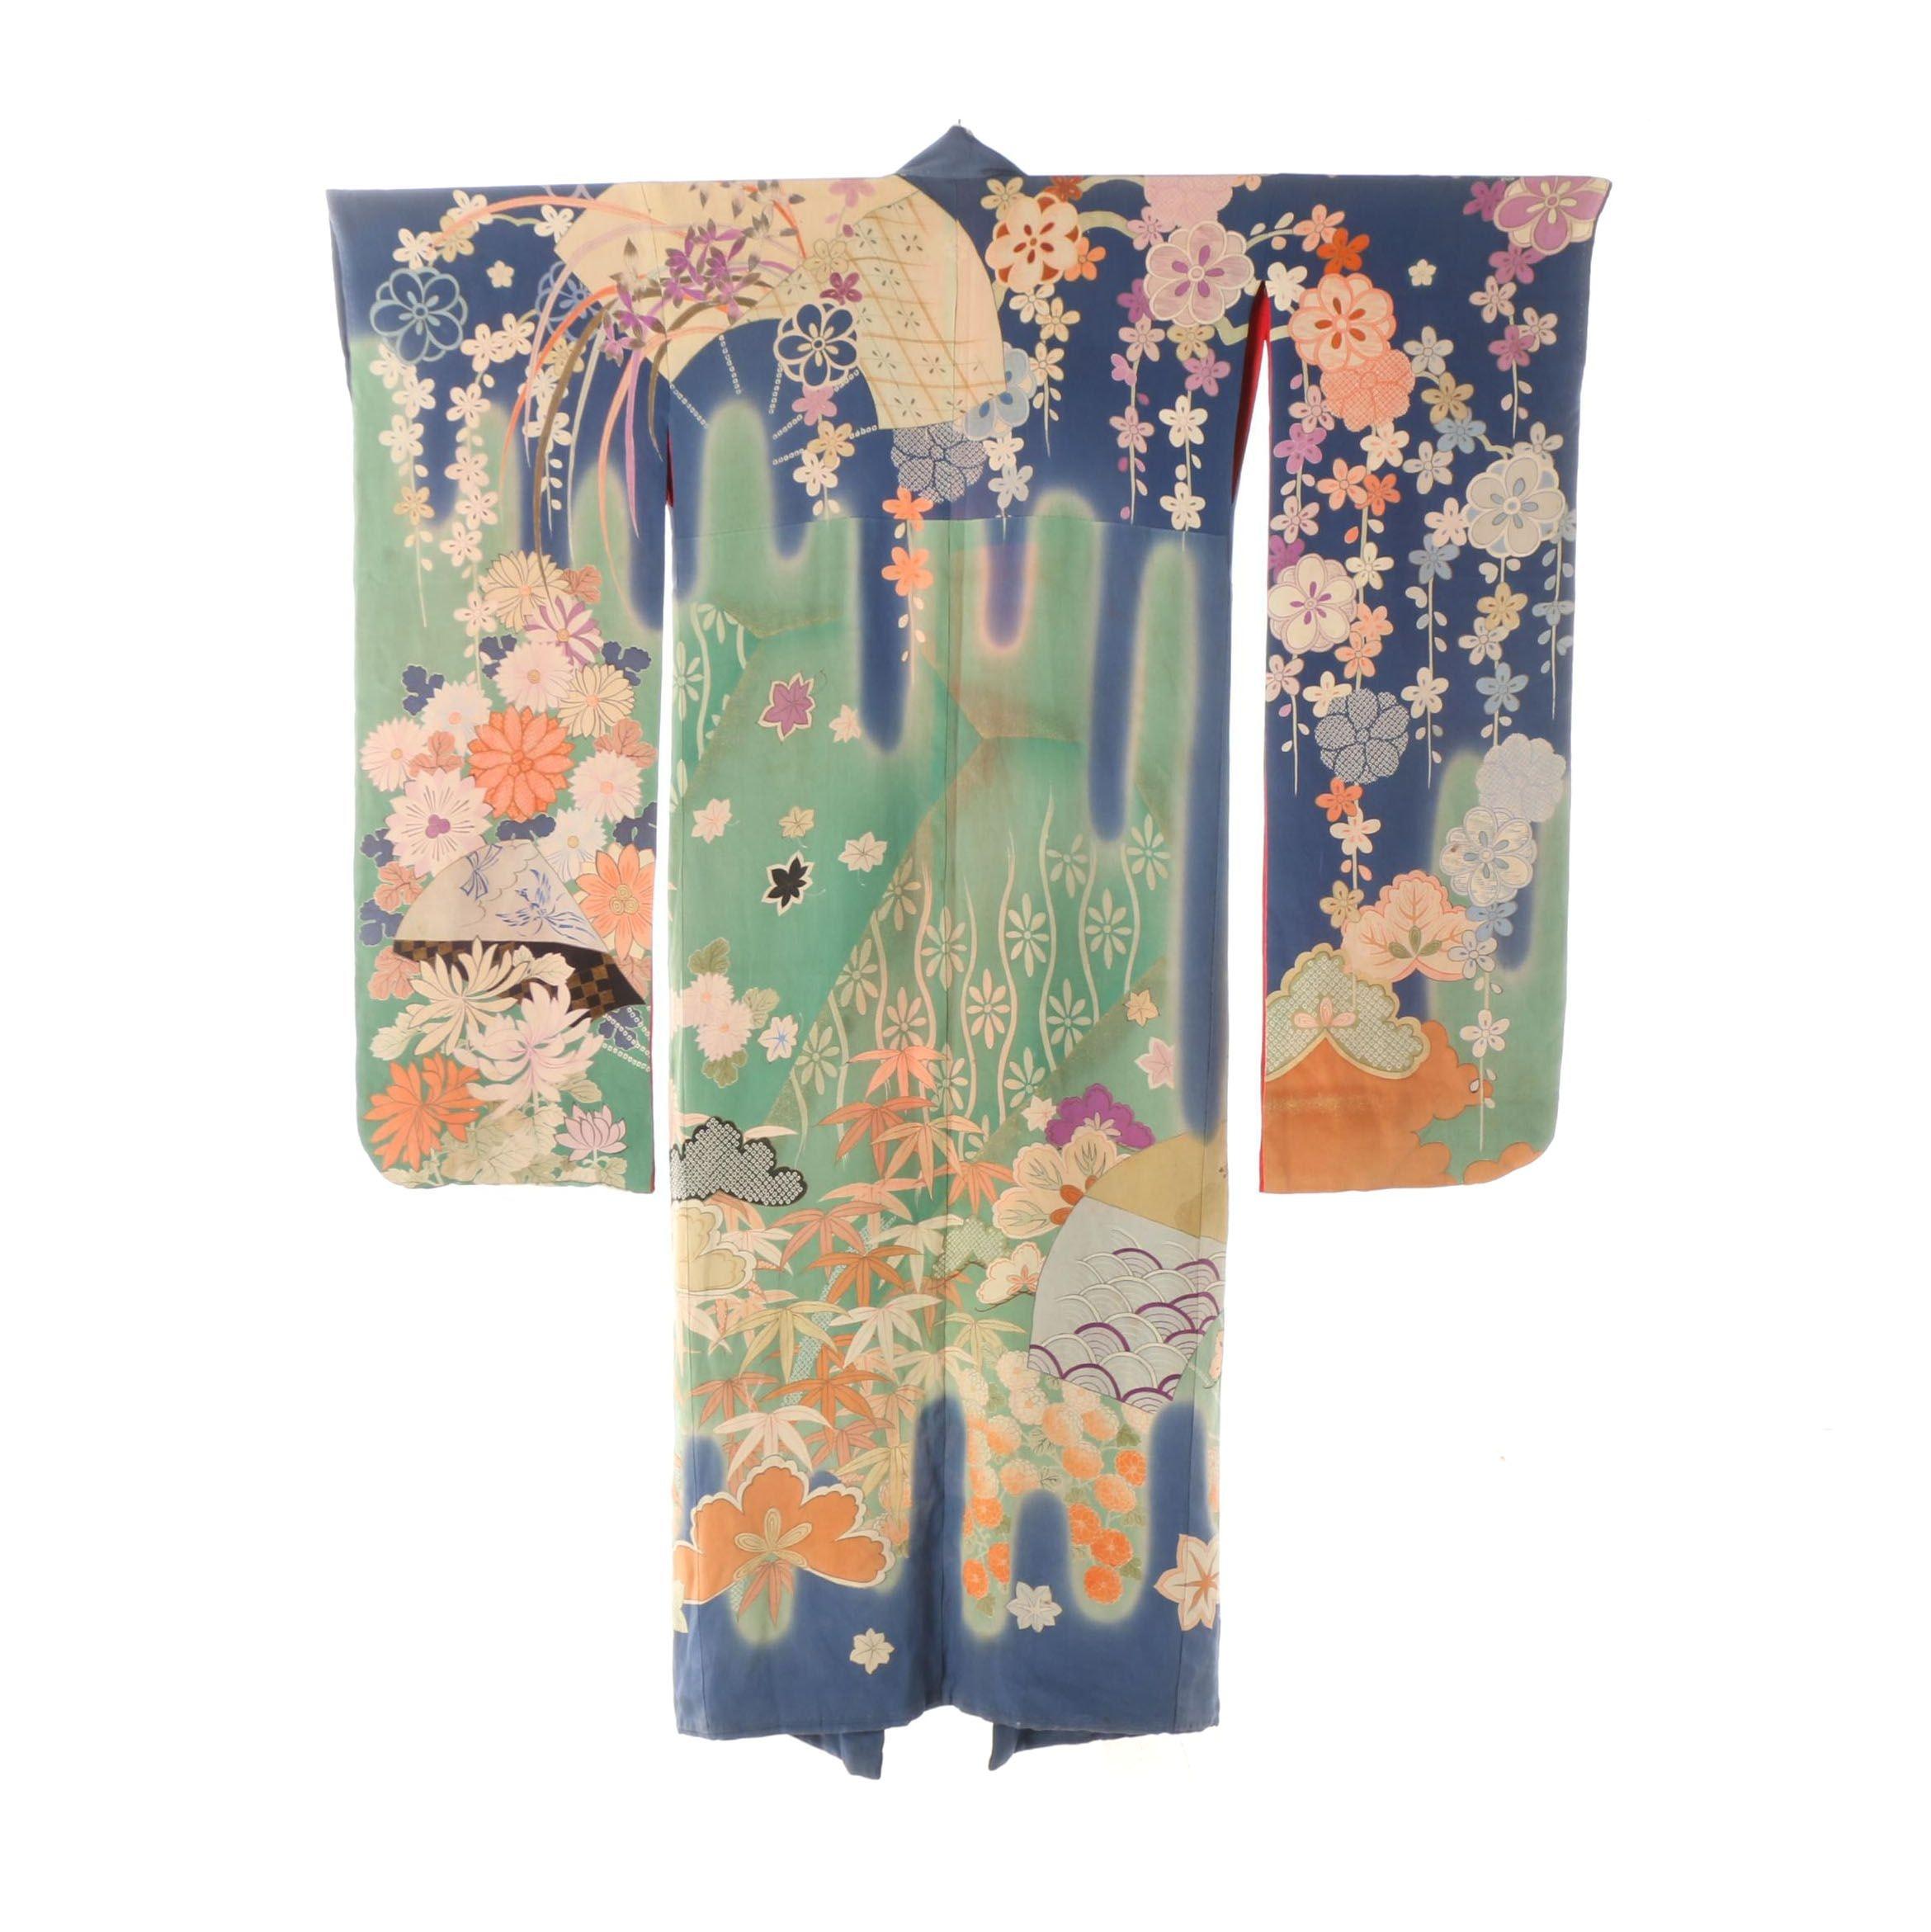 Circa 1915 G.T. Marsh & Co. Imported Japanese Handwoven Silk Furisode Kimono